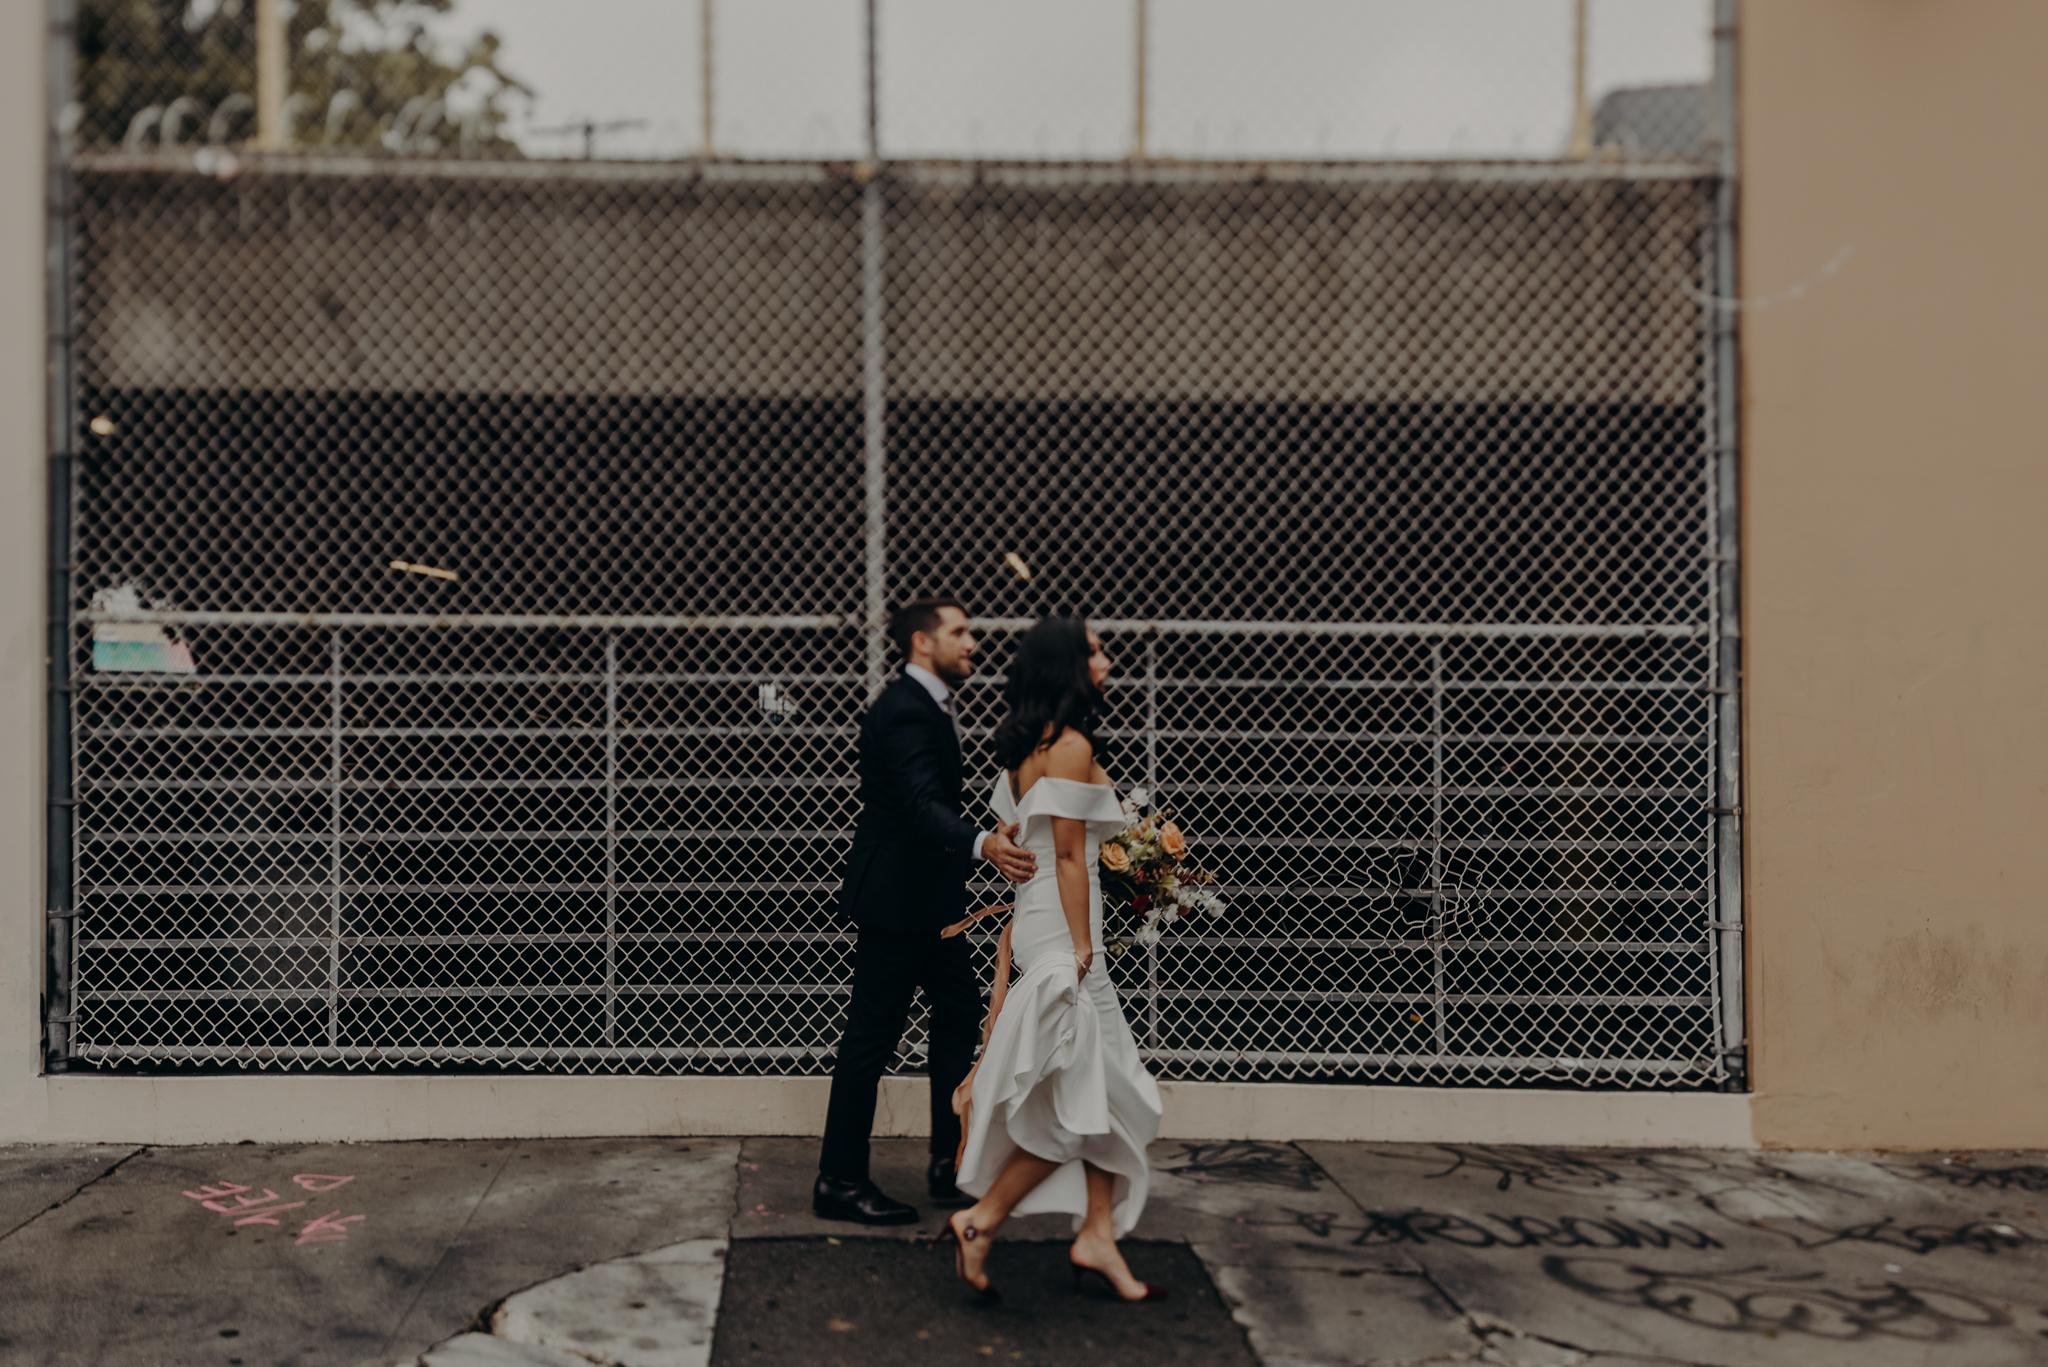 Wedding Photo LA - wedding photographer in los angeles - millwick wedding venue -isaiahandtaylor.com-070.jpg